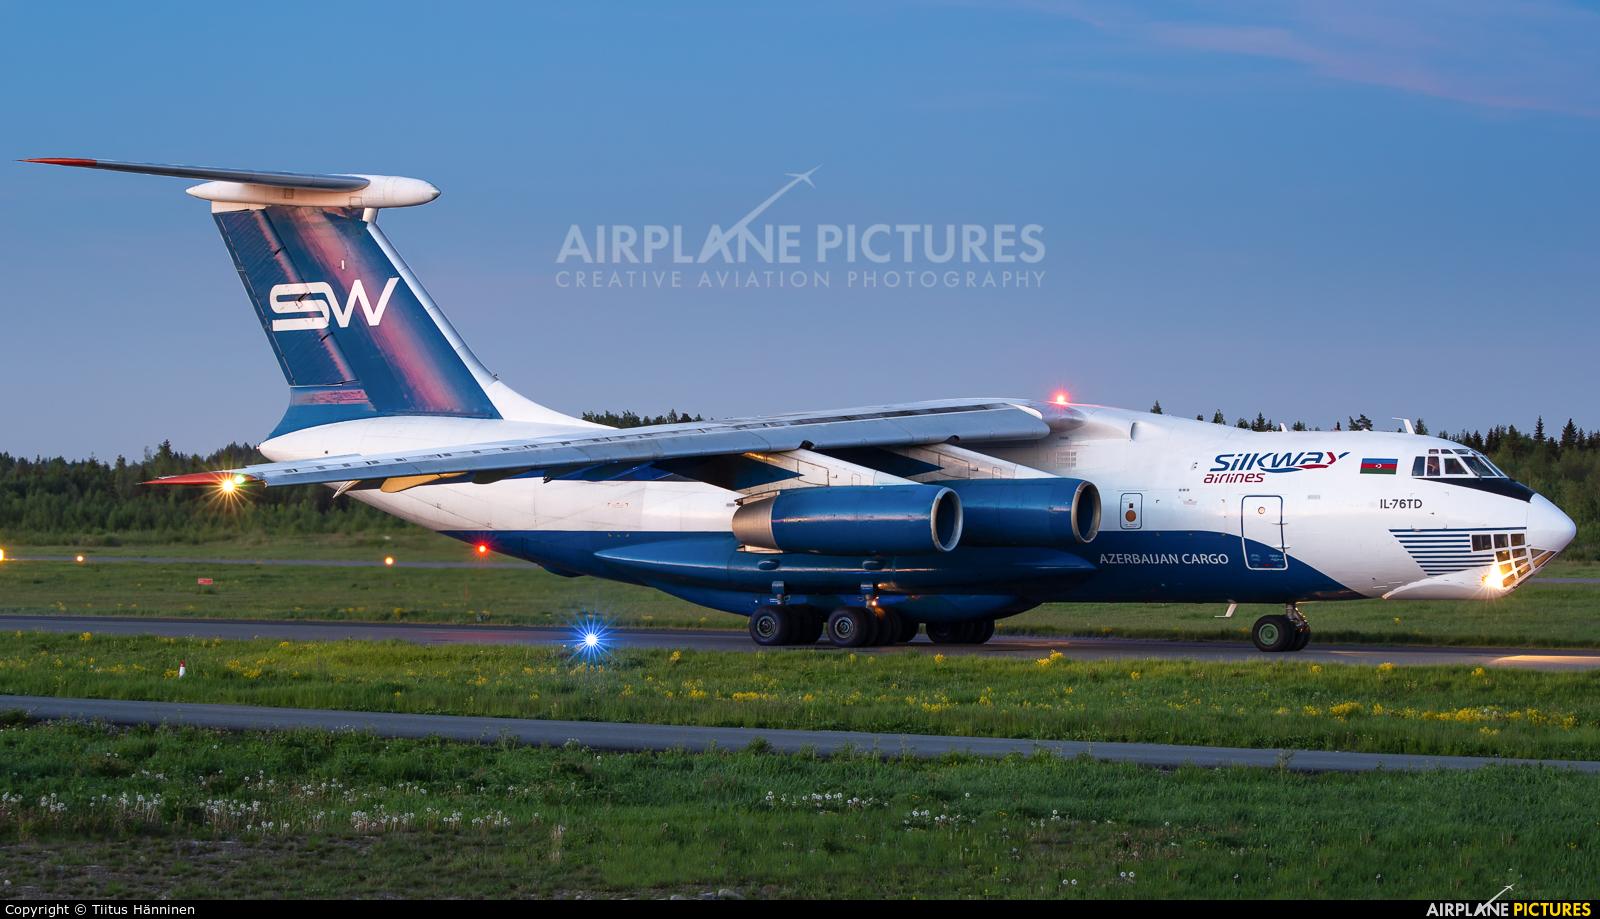 Silk Way Airlines 4K-AZ40 aircraft at Tampere-Pirkkala